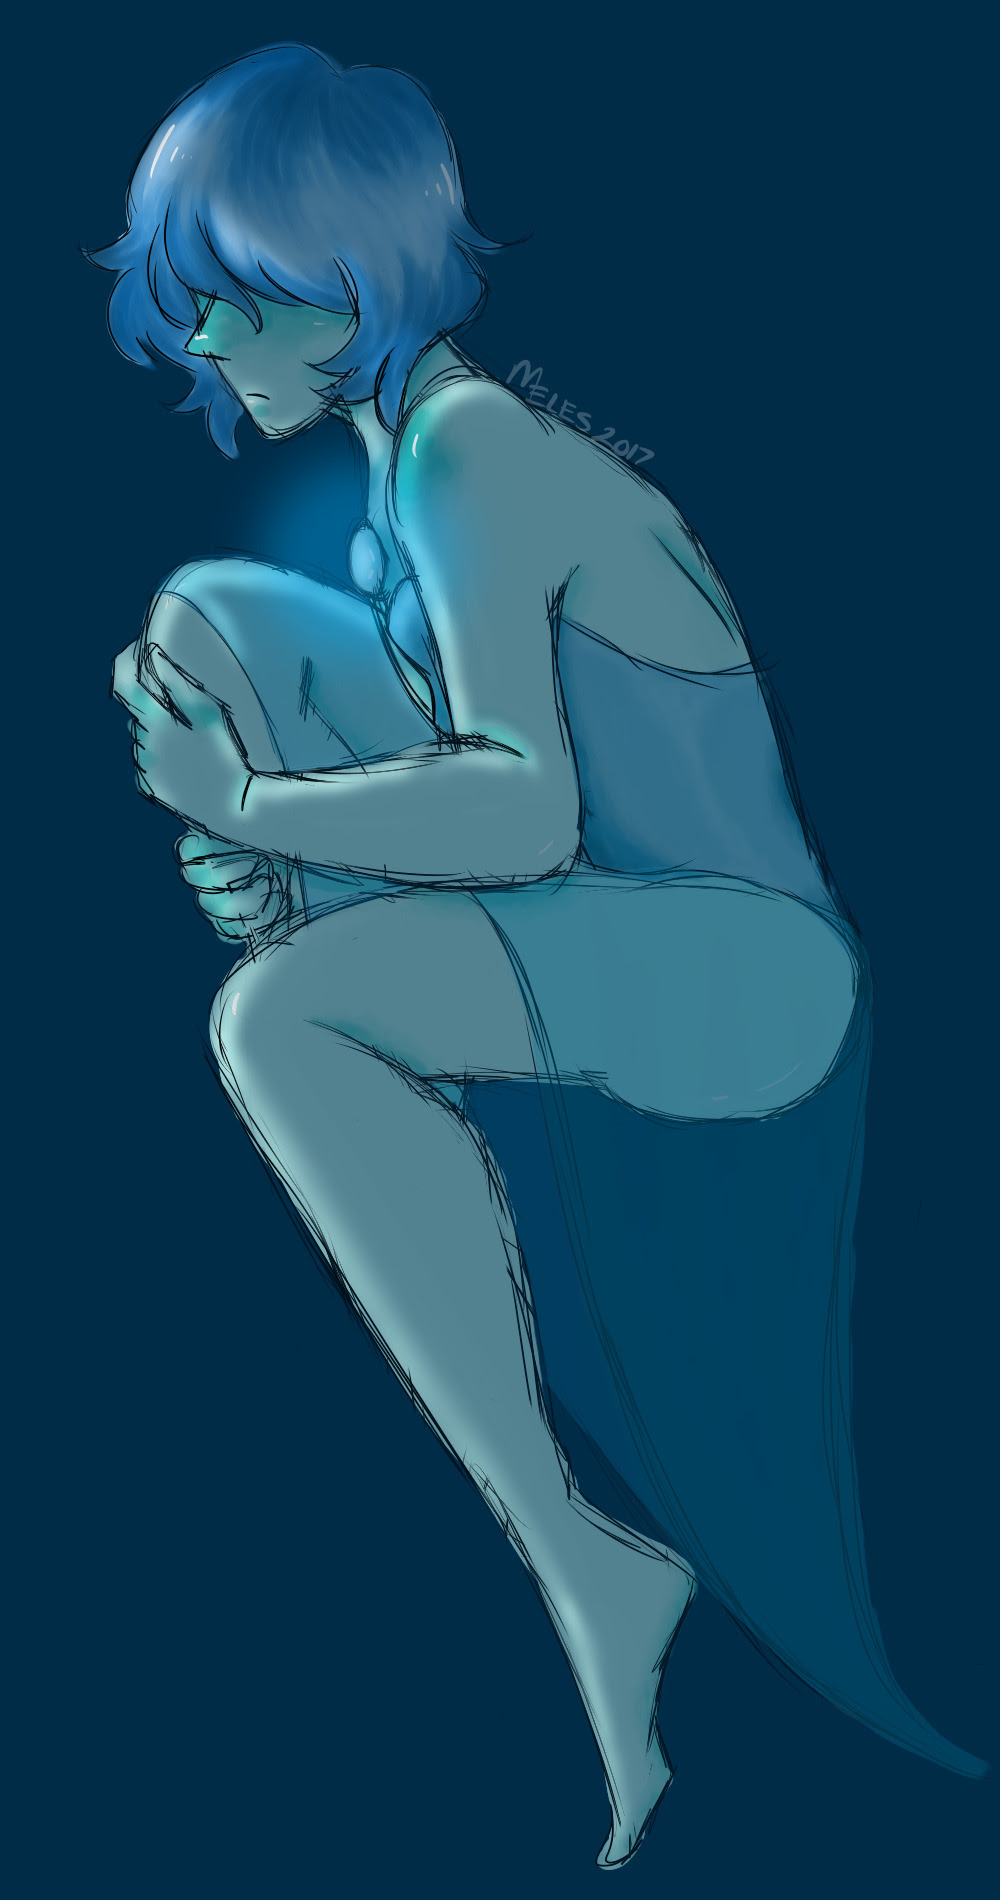 Feeling Blue Reblogs > Likes